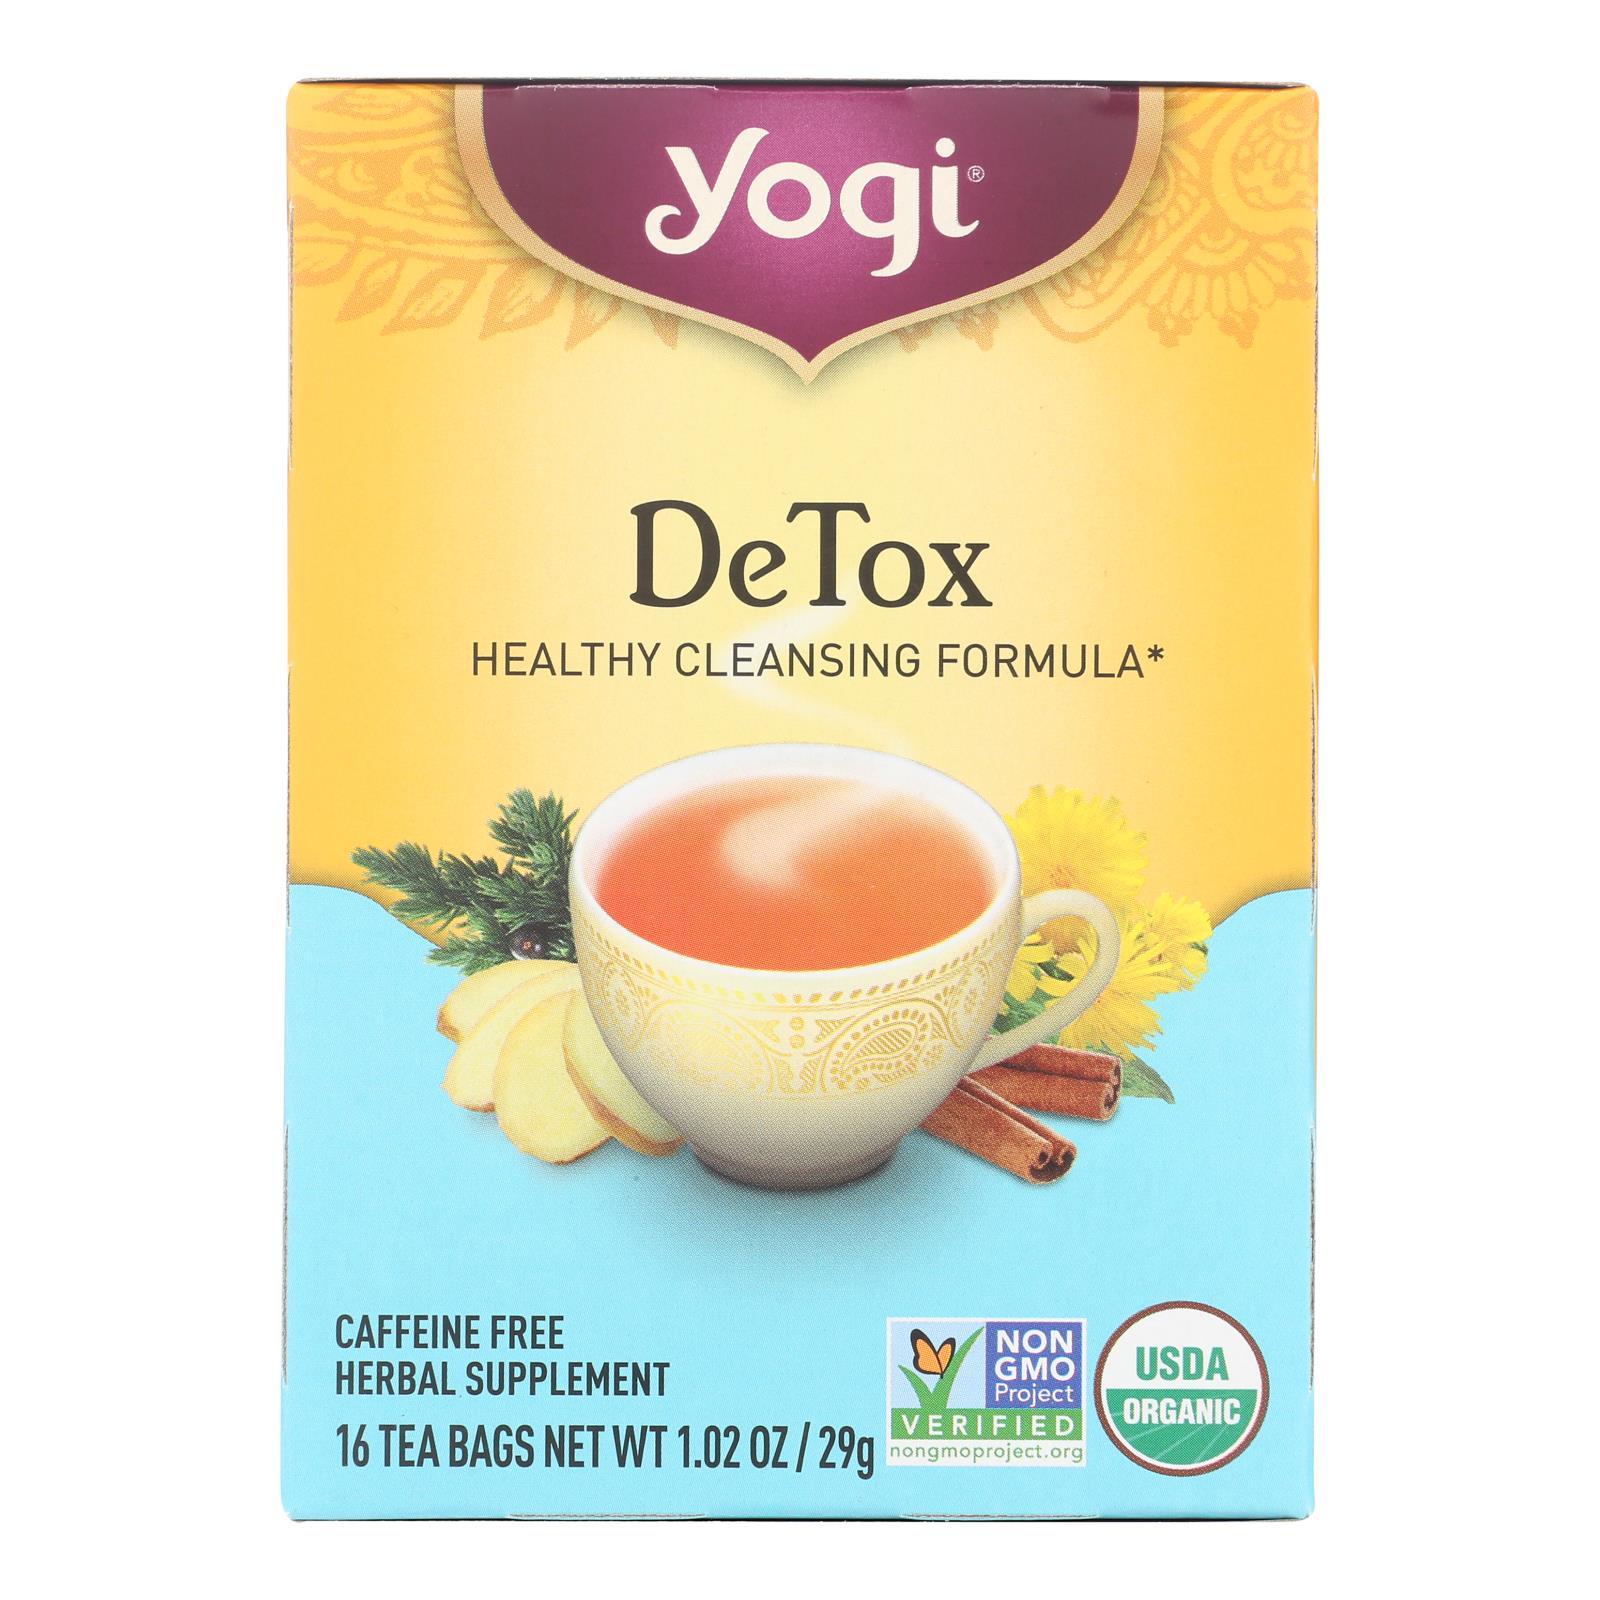 Yogi Detox Herbal Tea Caffeine Free - 16 Tea Bags - Case of 6